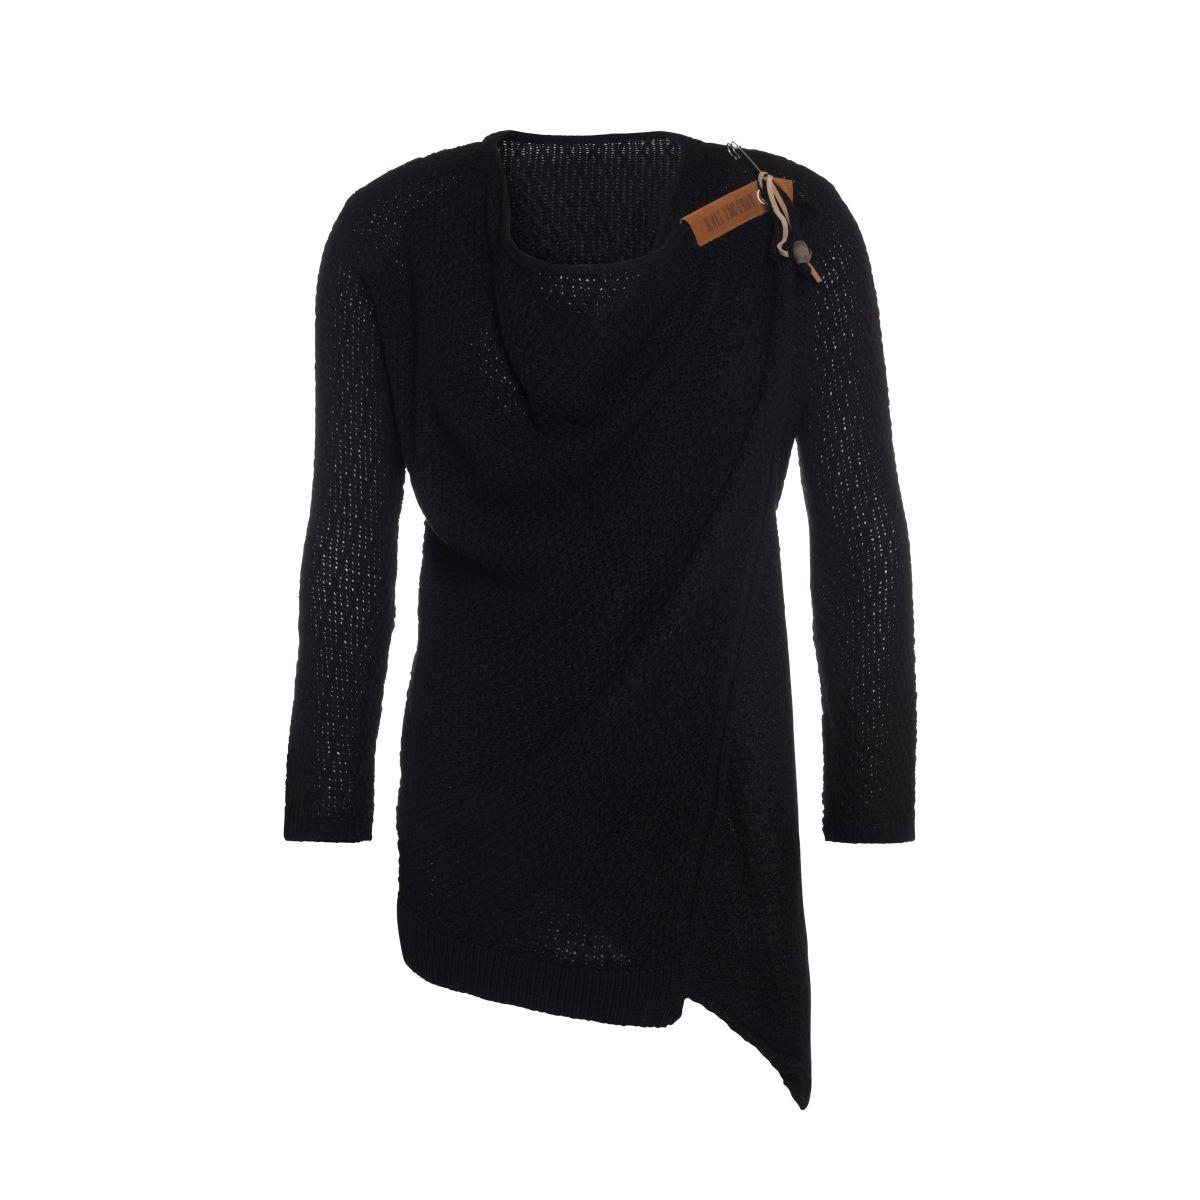 emy knitted cardigan black 3638